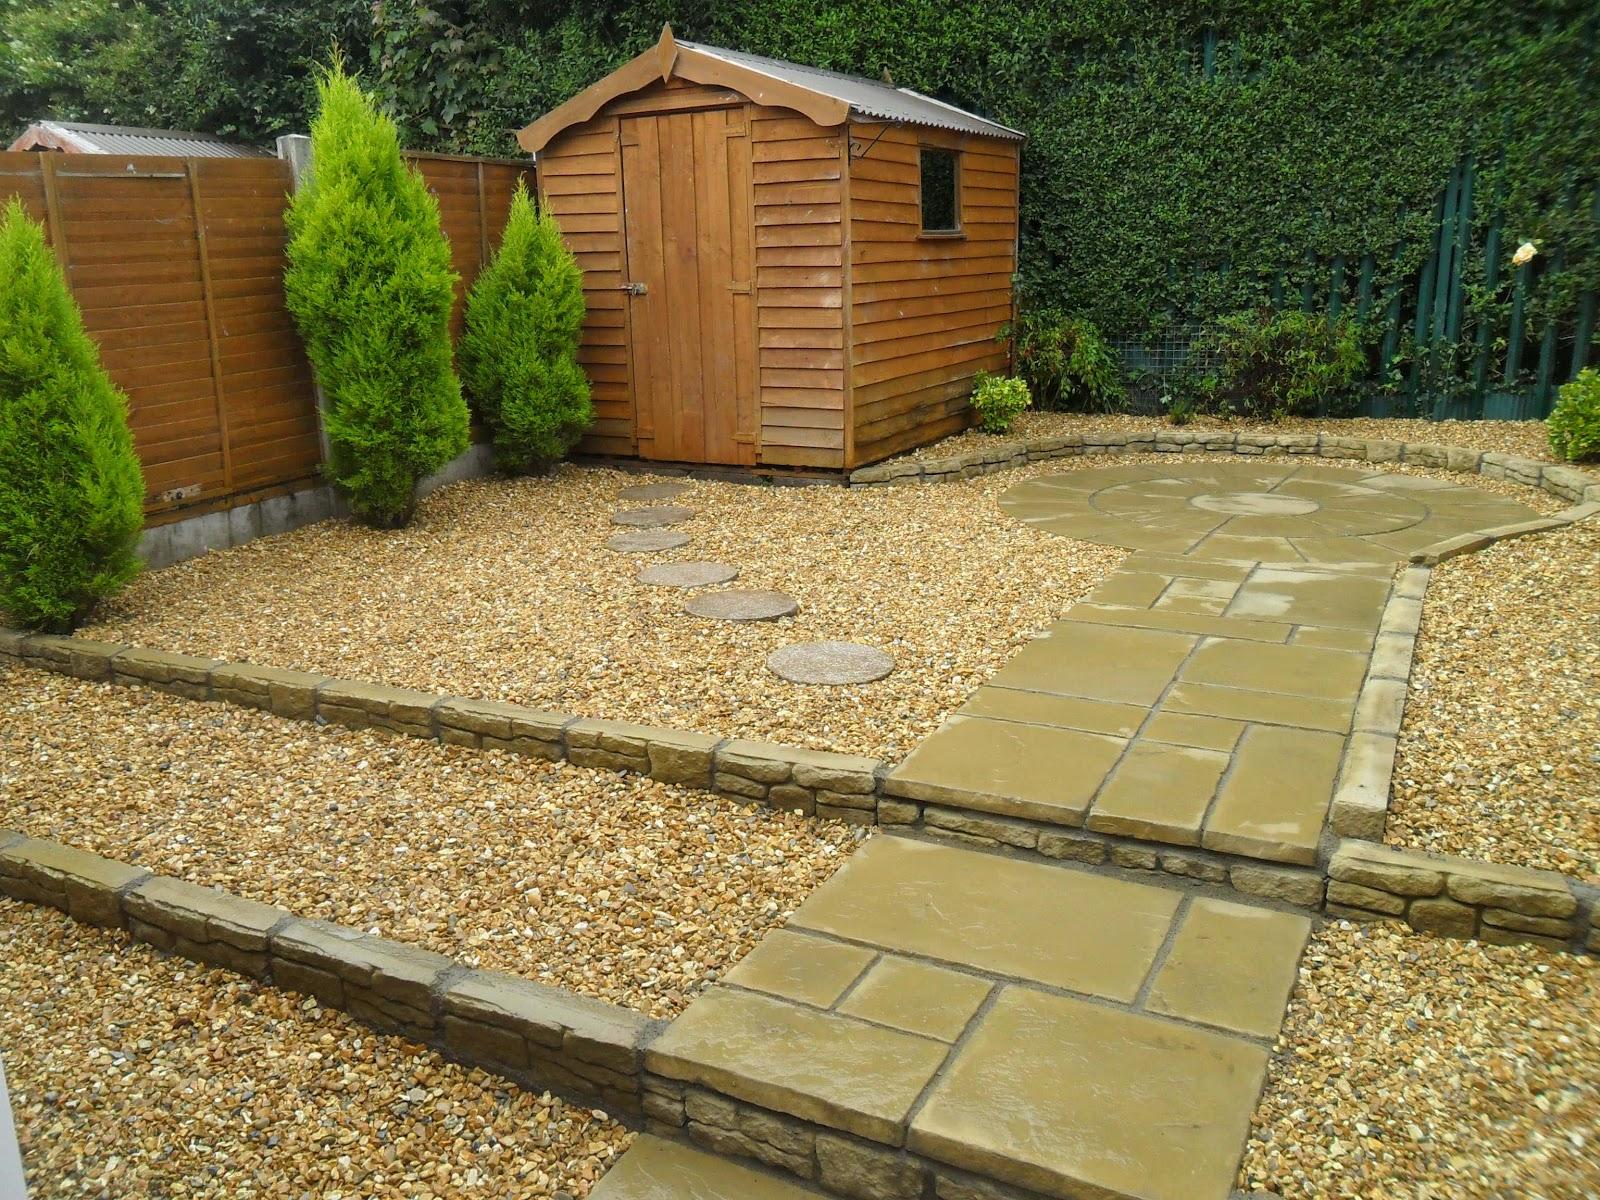 Greenart landscapes garden design construction and for Hard surface garden designs